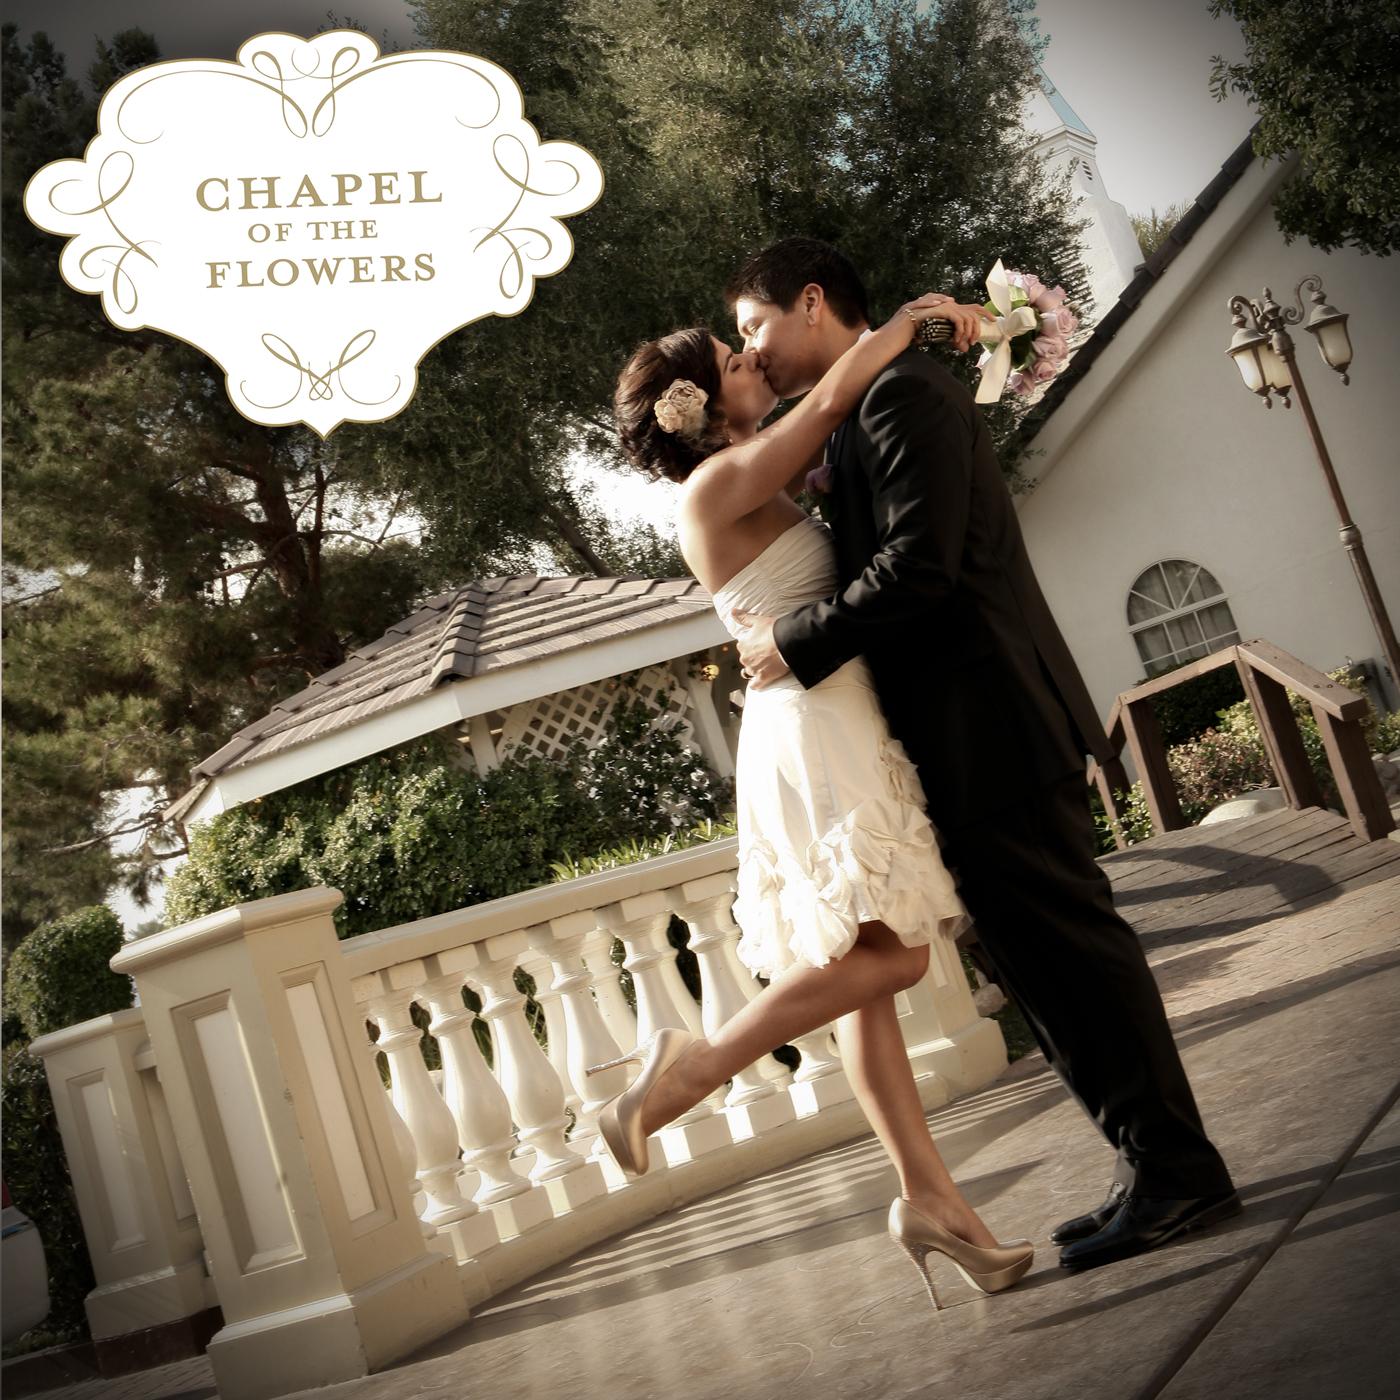 Chapel of the Flowers Leading Las Vegas Wedding Chapel Announces Two New Pr